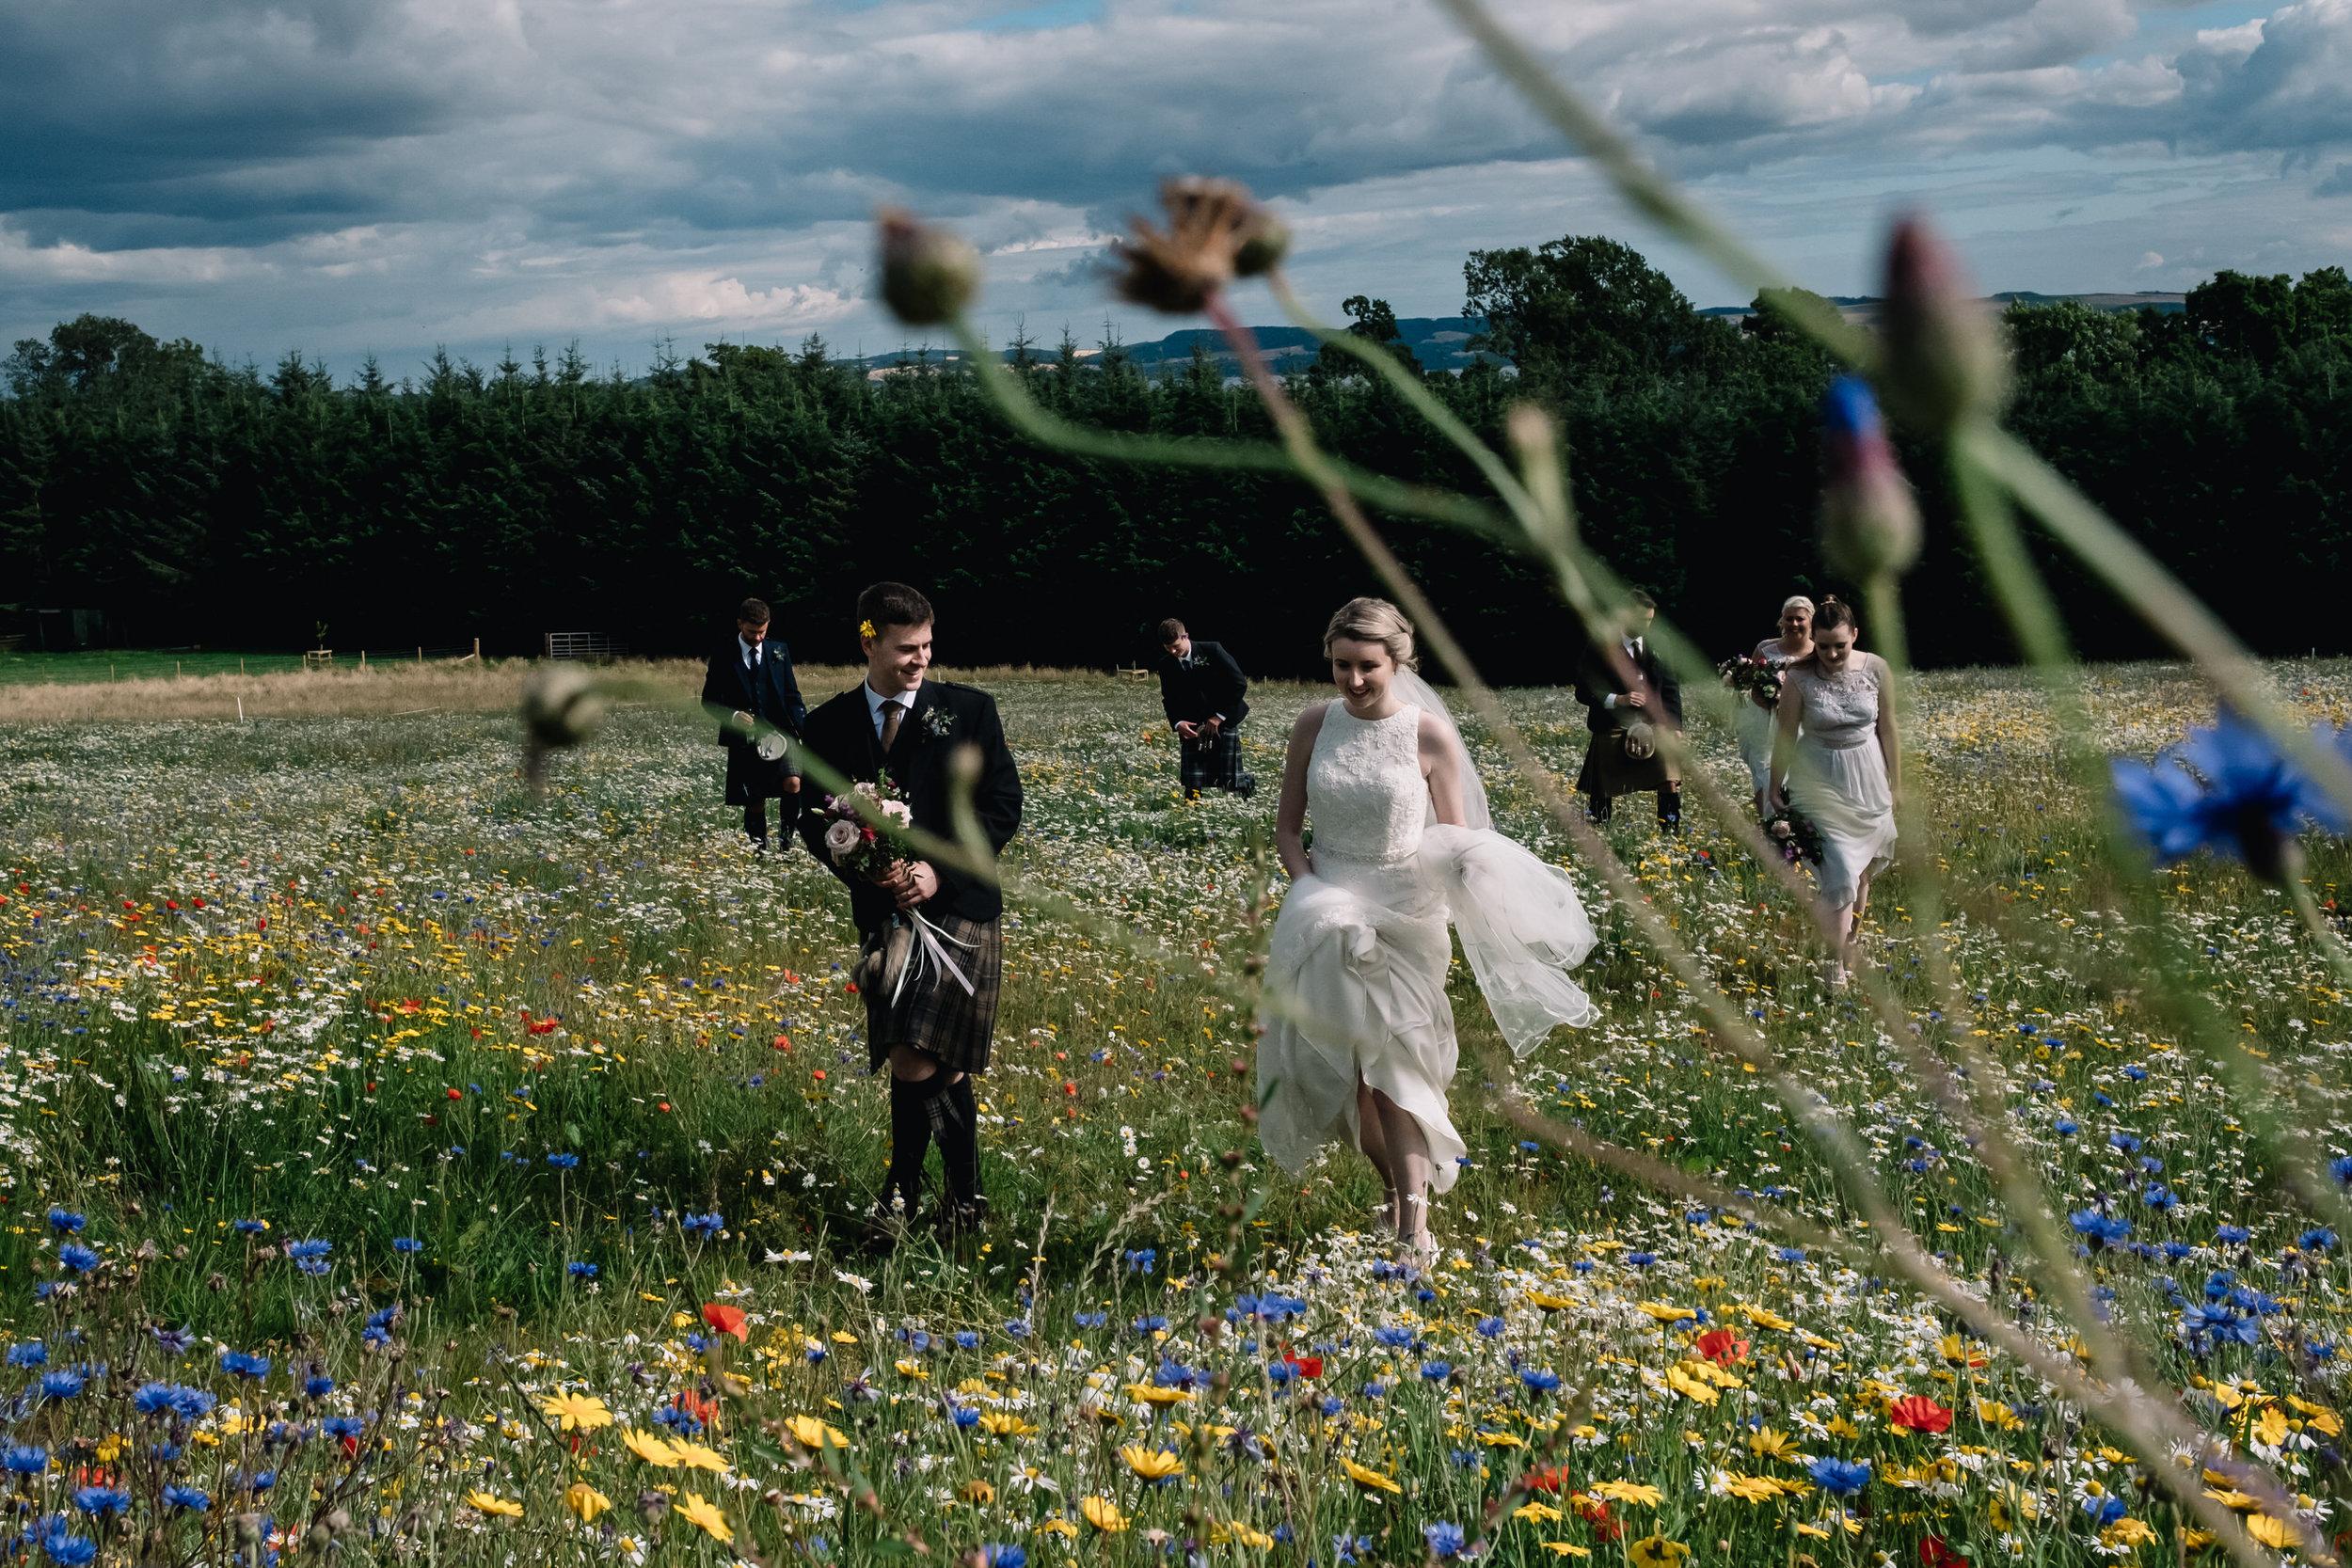 Bridal party walk in field of wild flowers